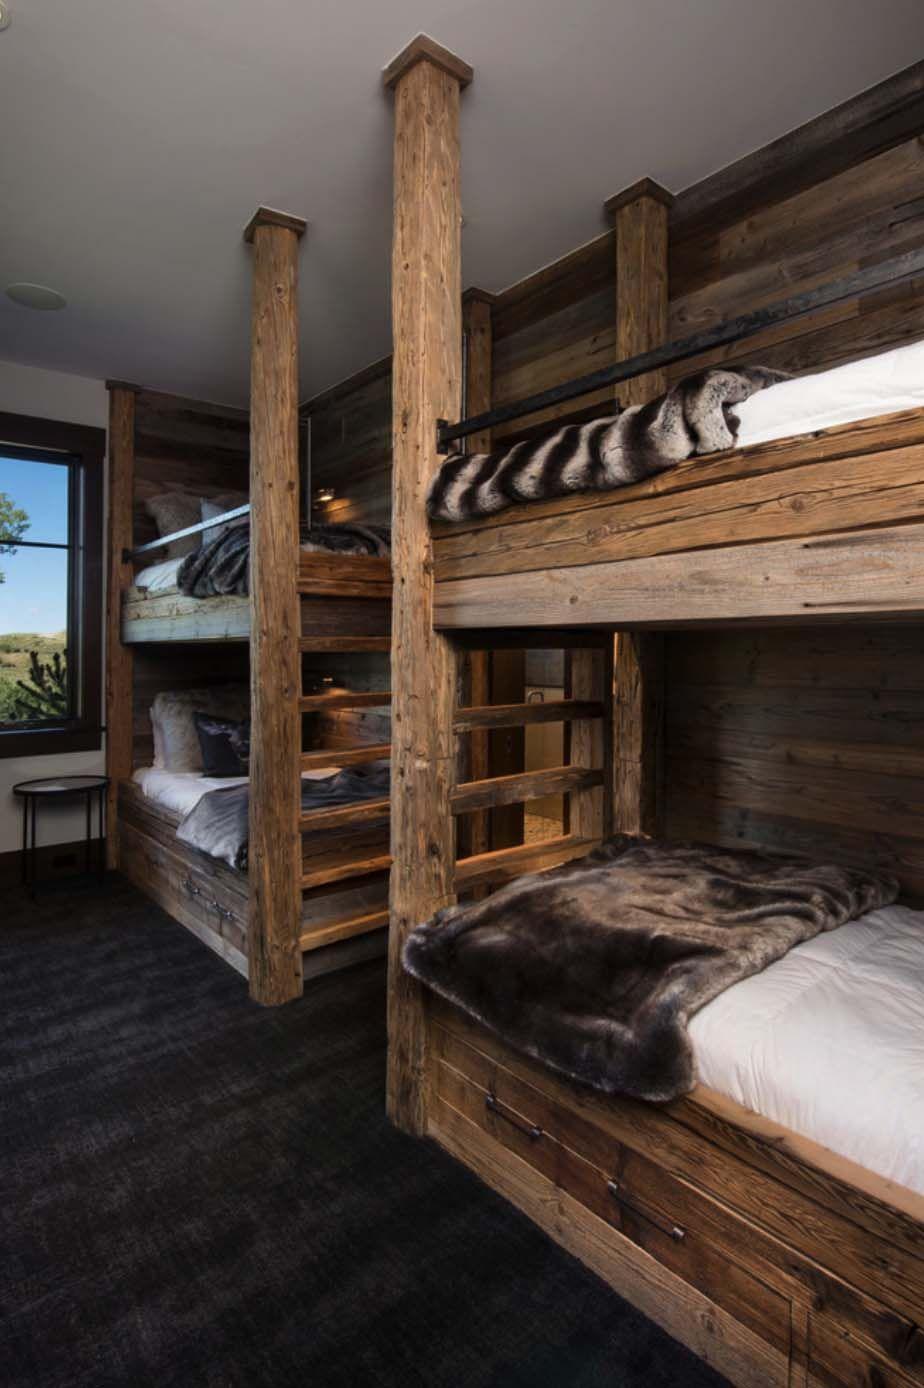 Contemporary Mountain Retreat In Colorado Infused With Warmth Idee Maison Futur En 2019